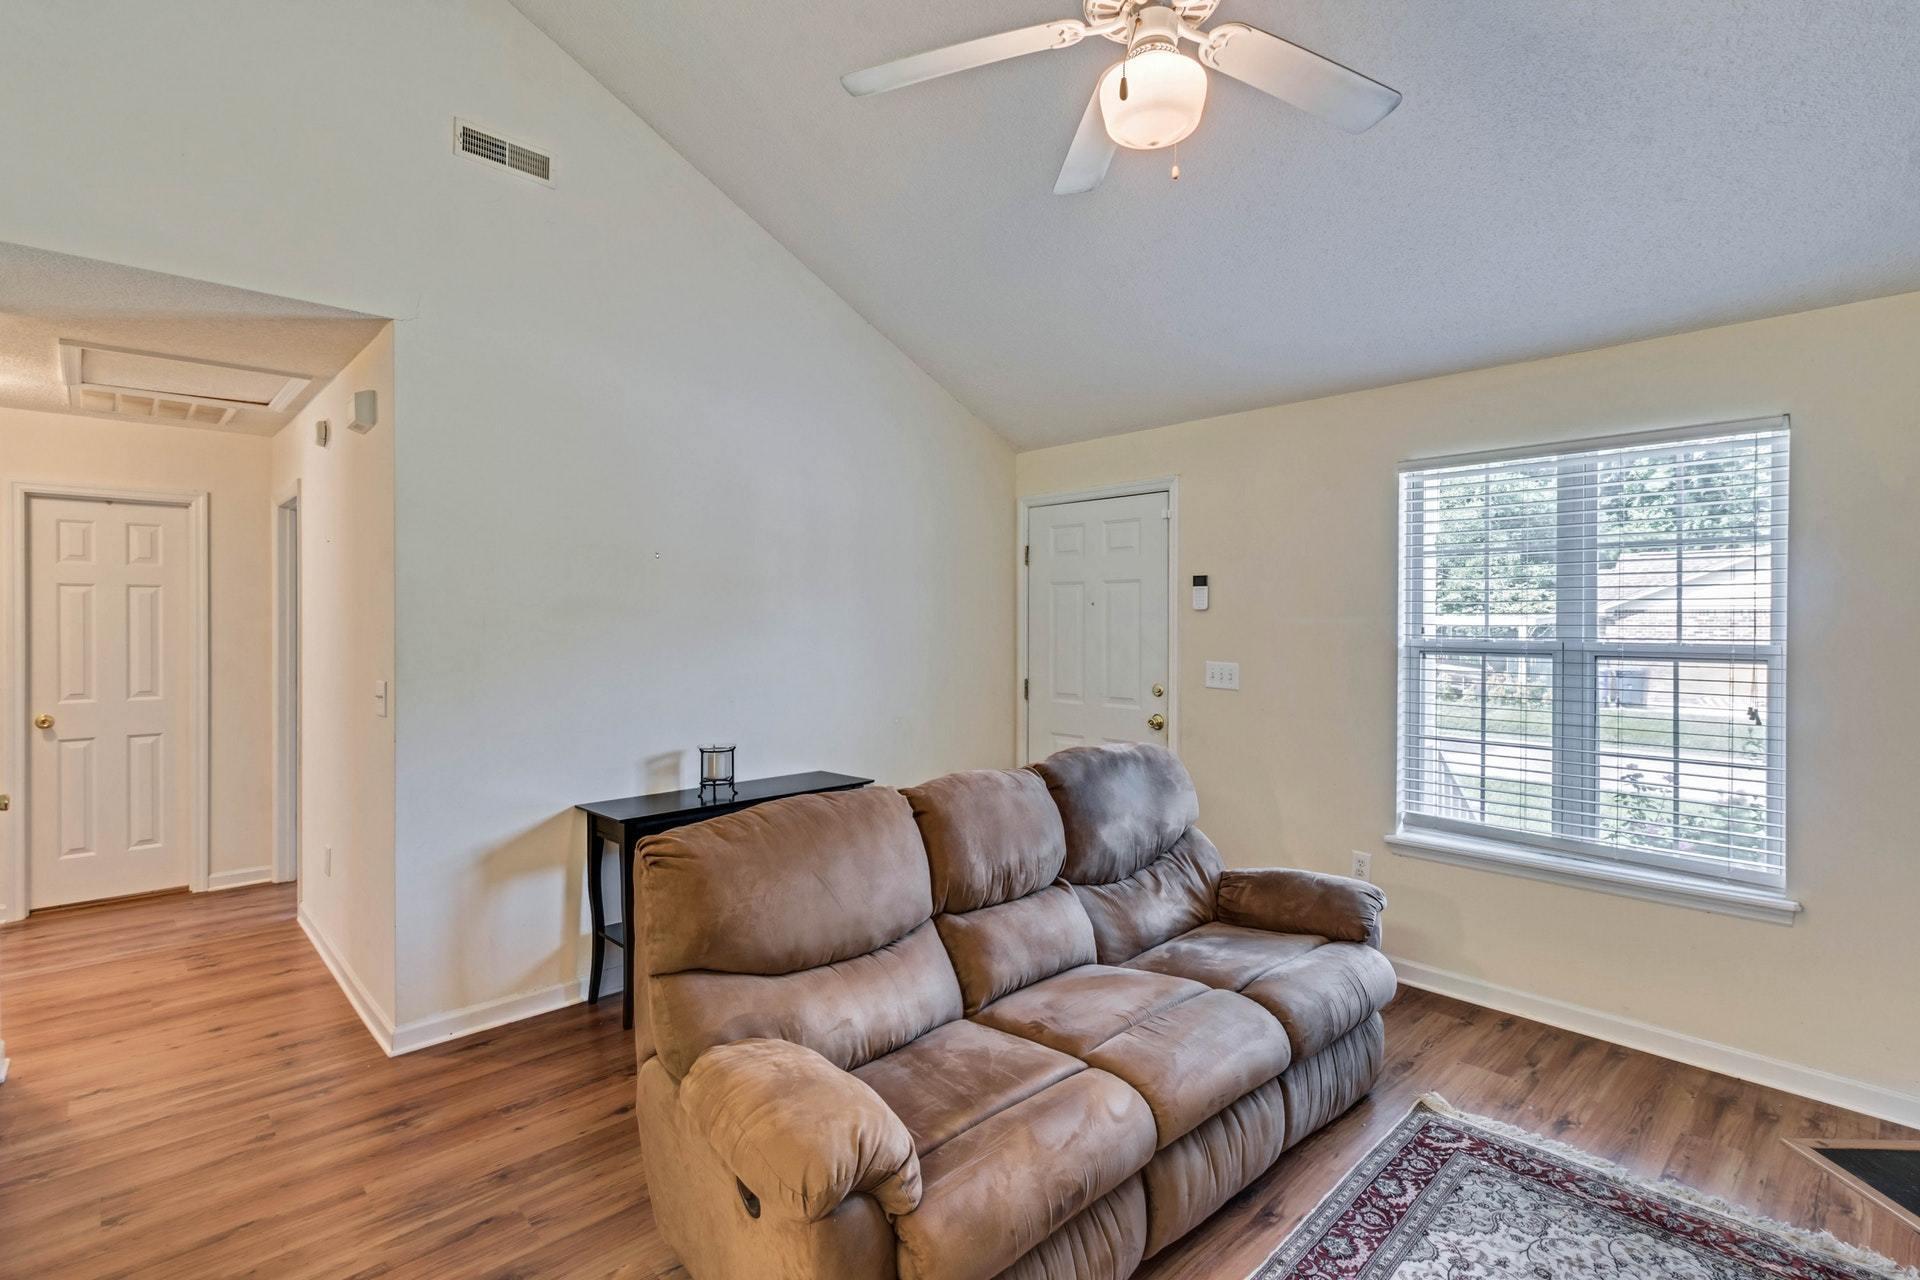 Double Oaks Homes For Sale - 2402 Double Oak, Charleston, SC - 5